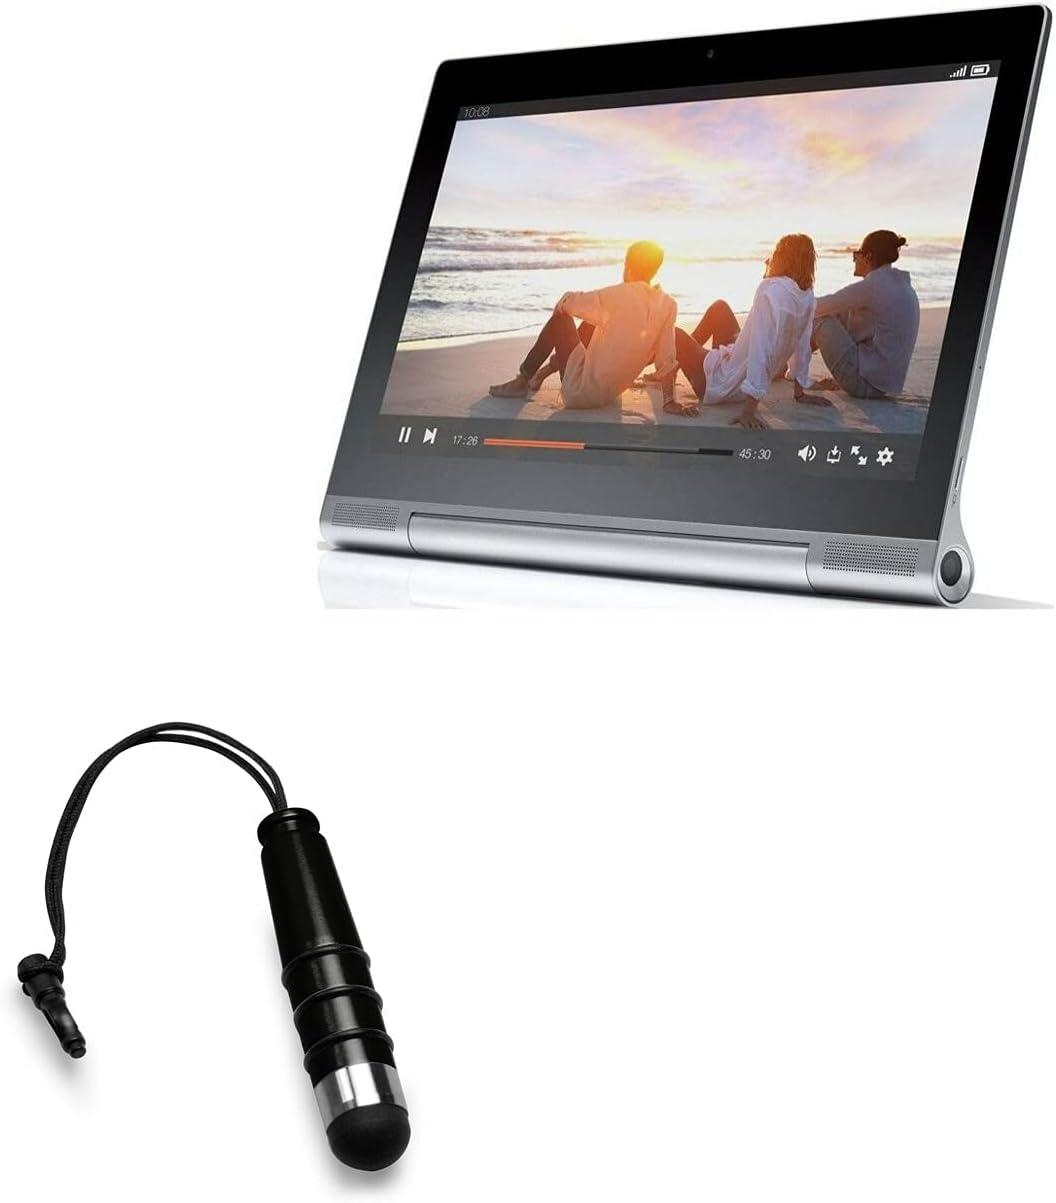 Stylus Pen for Lenovo Yoga Tablet 2 Pro (Stylus Pen by BoxWave) - Mini Capacitive Stylus, Small Rubber Tip Capacitive Stylus Pen for Lenovo Yoga Tablet 2 Pro - Jet Black